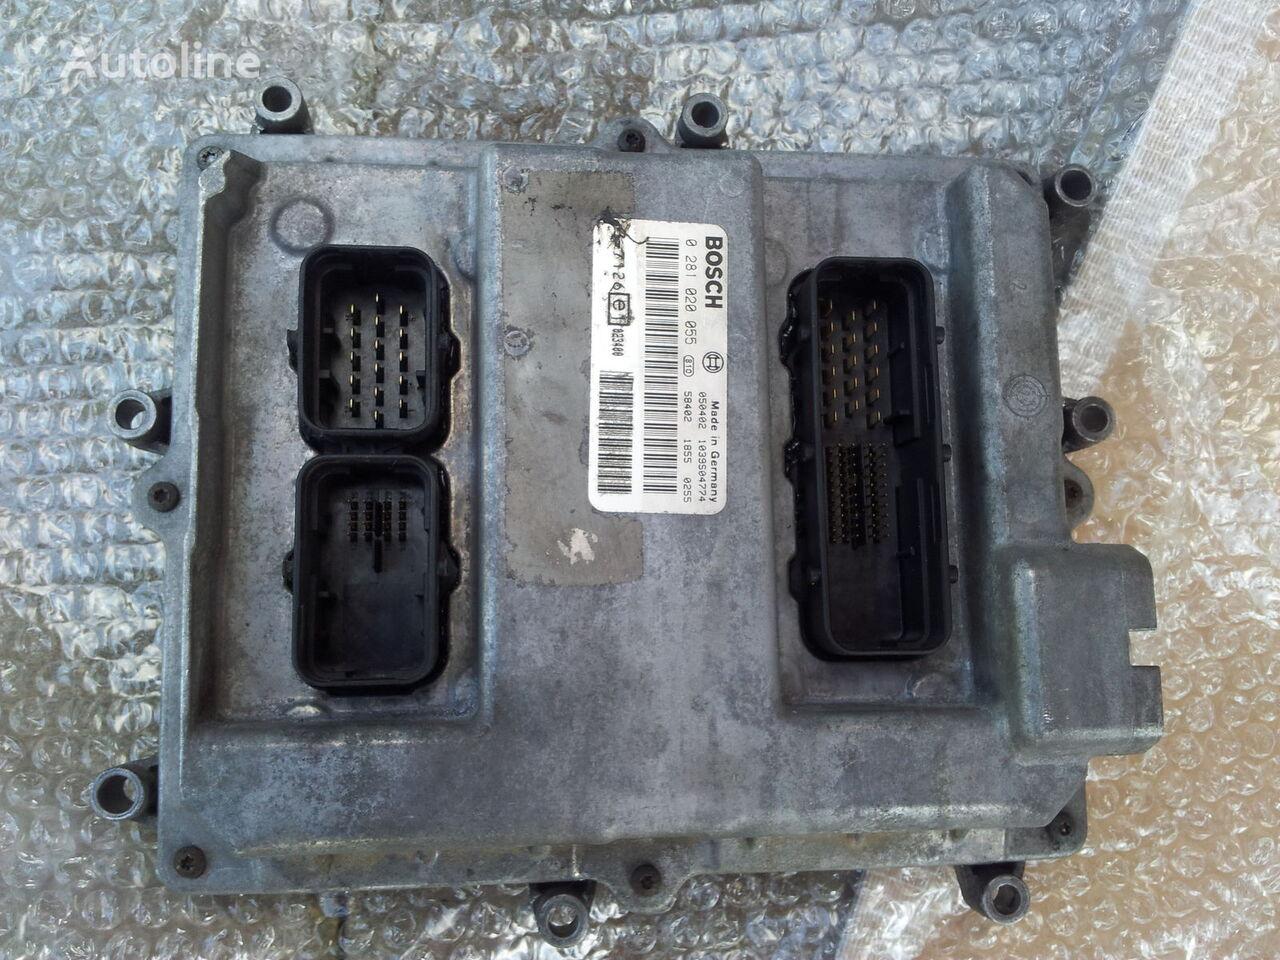 MAN Common Rail EDC, ECU electronic diesel control 0281020055, D2066LF01, 51258037126, 51258337169, 51258037127, 51258337168 unitate de control pentru MAN TGA autotractor